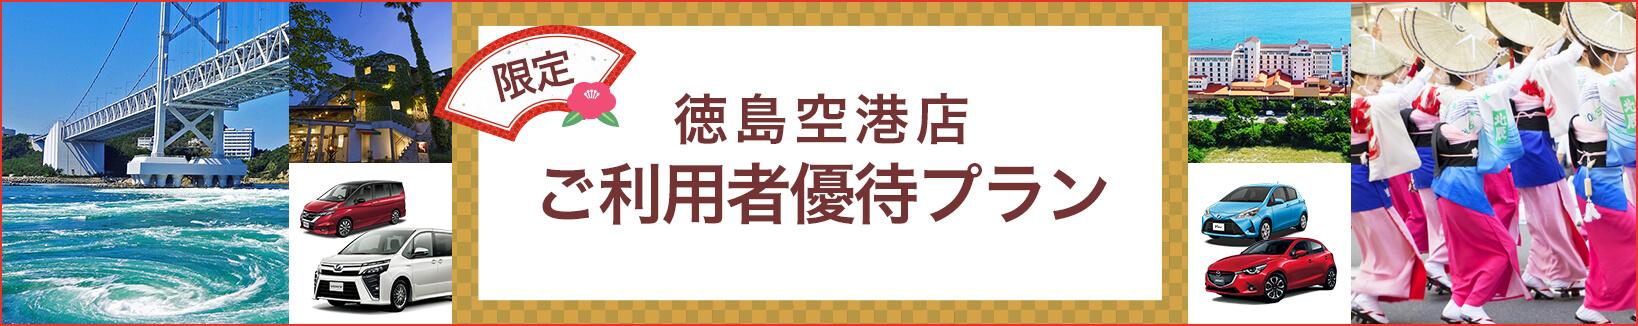 https://www.skyrent.jp/tokushima-otoku/